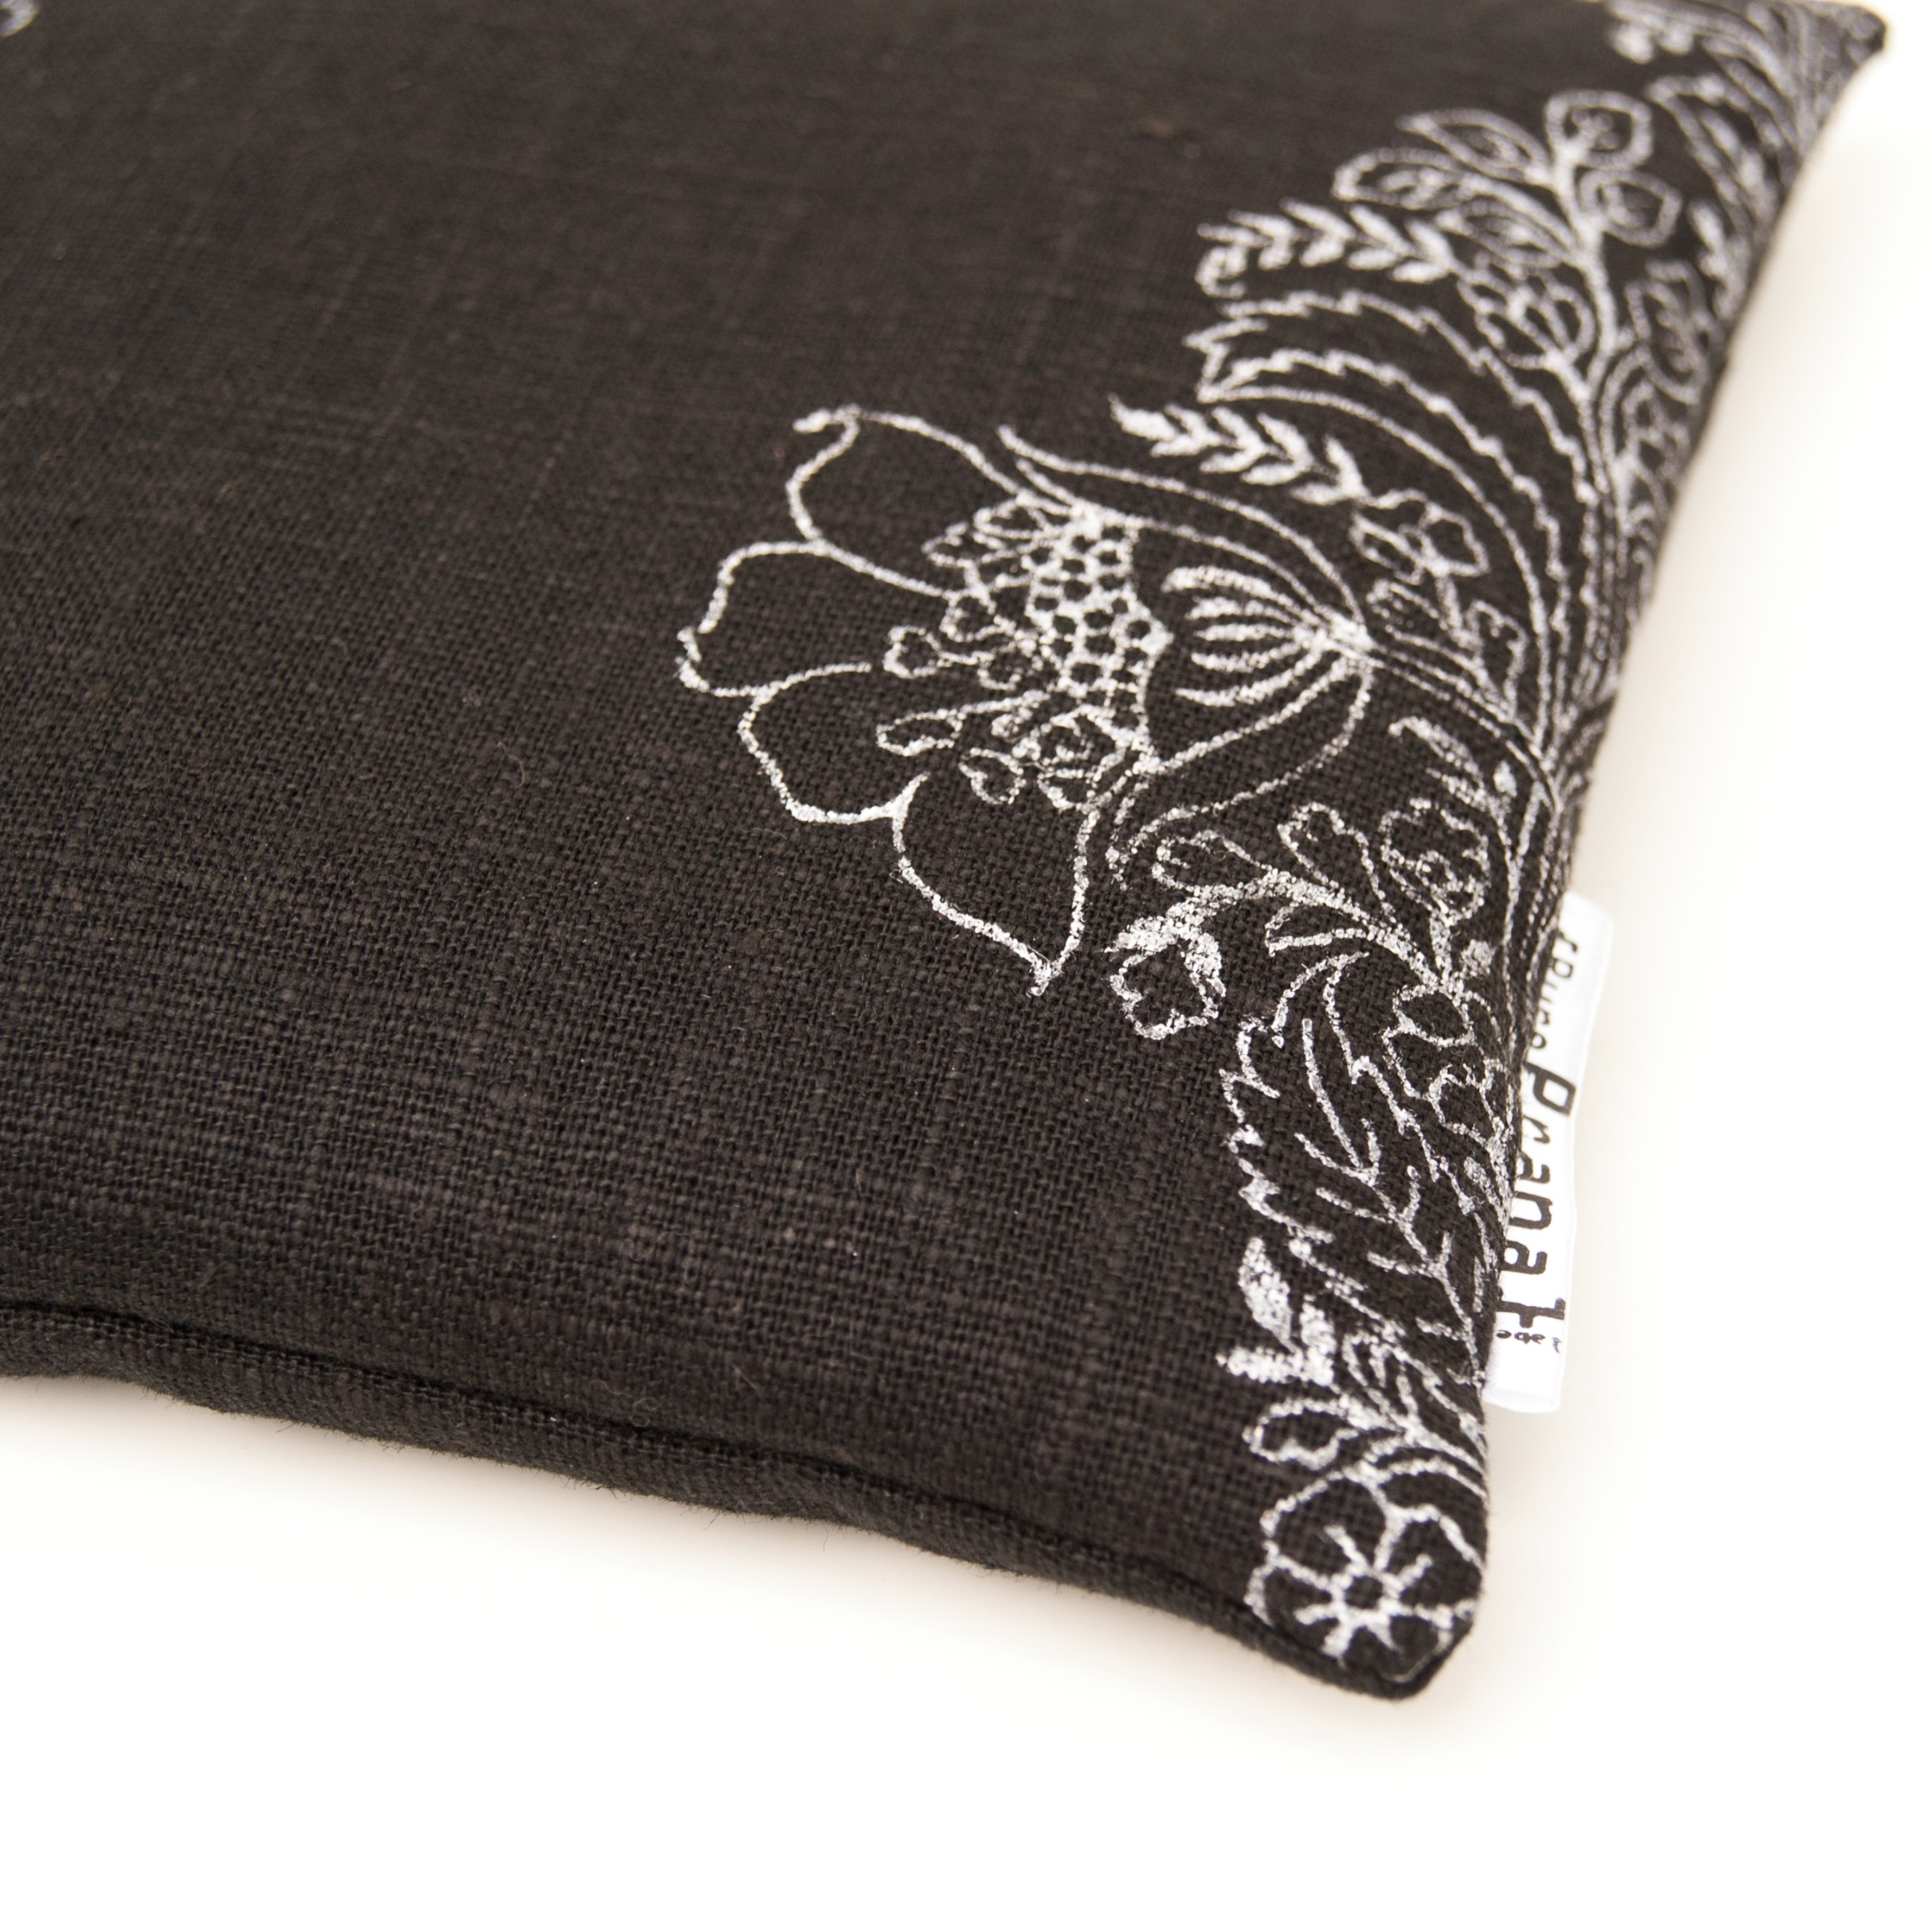 singing bowl cushion in black